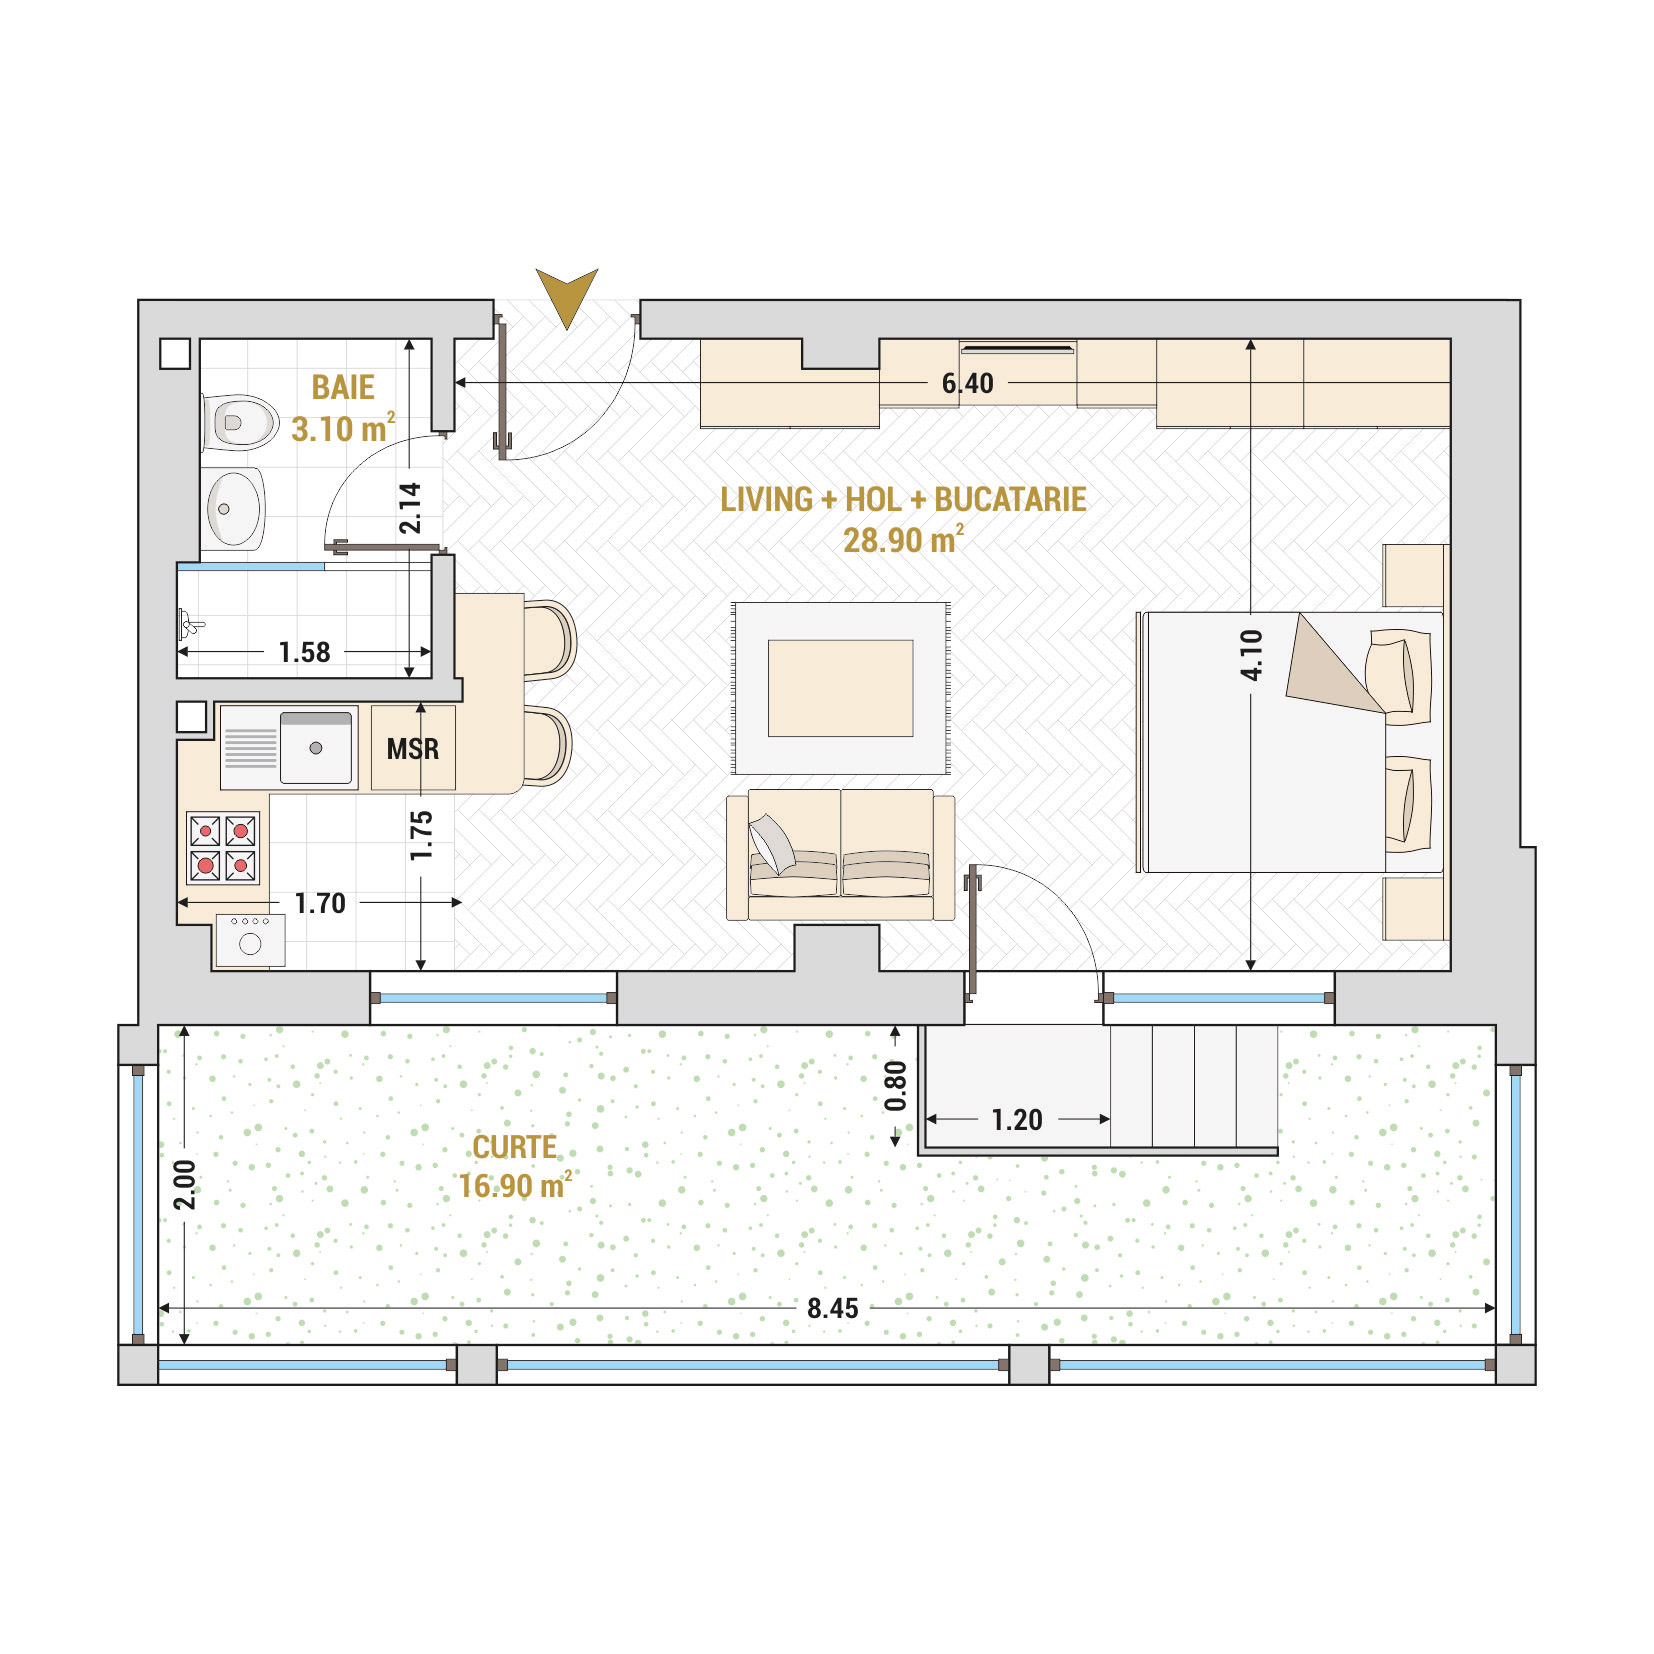 Garsoniere de vanzare Bucuresti - Catedral Residence - Marriott, Piata Unirii, 13 Septembrie, Izvor - Tip 6 - T1A